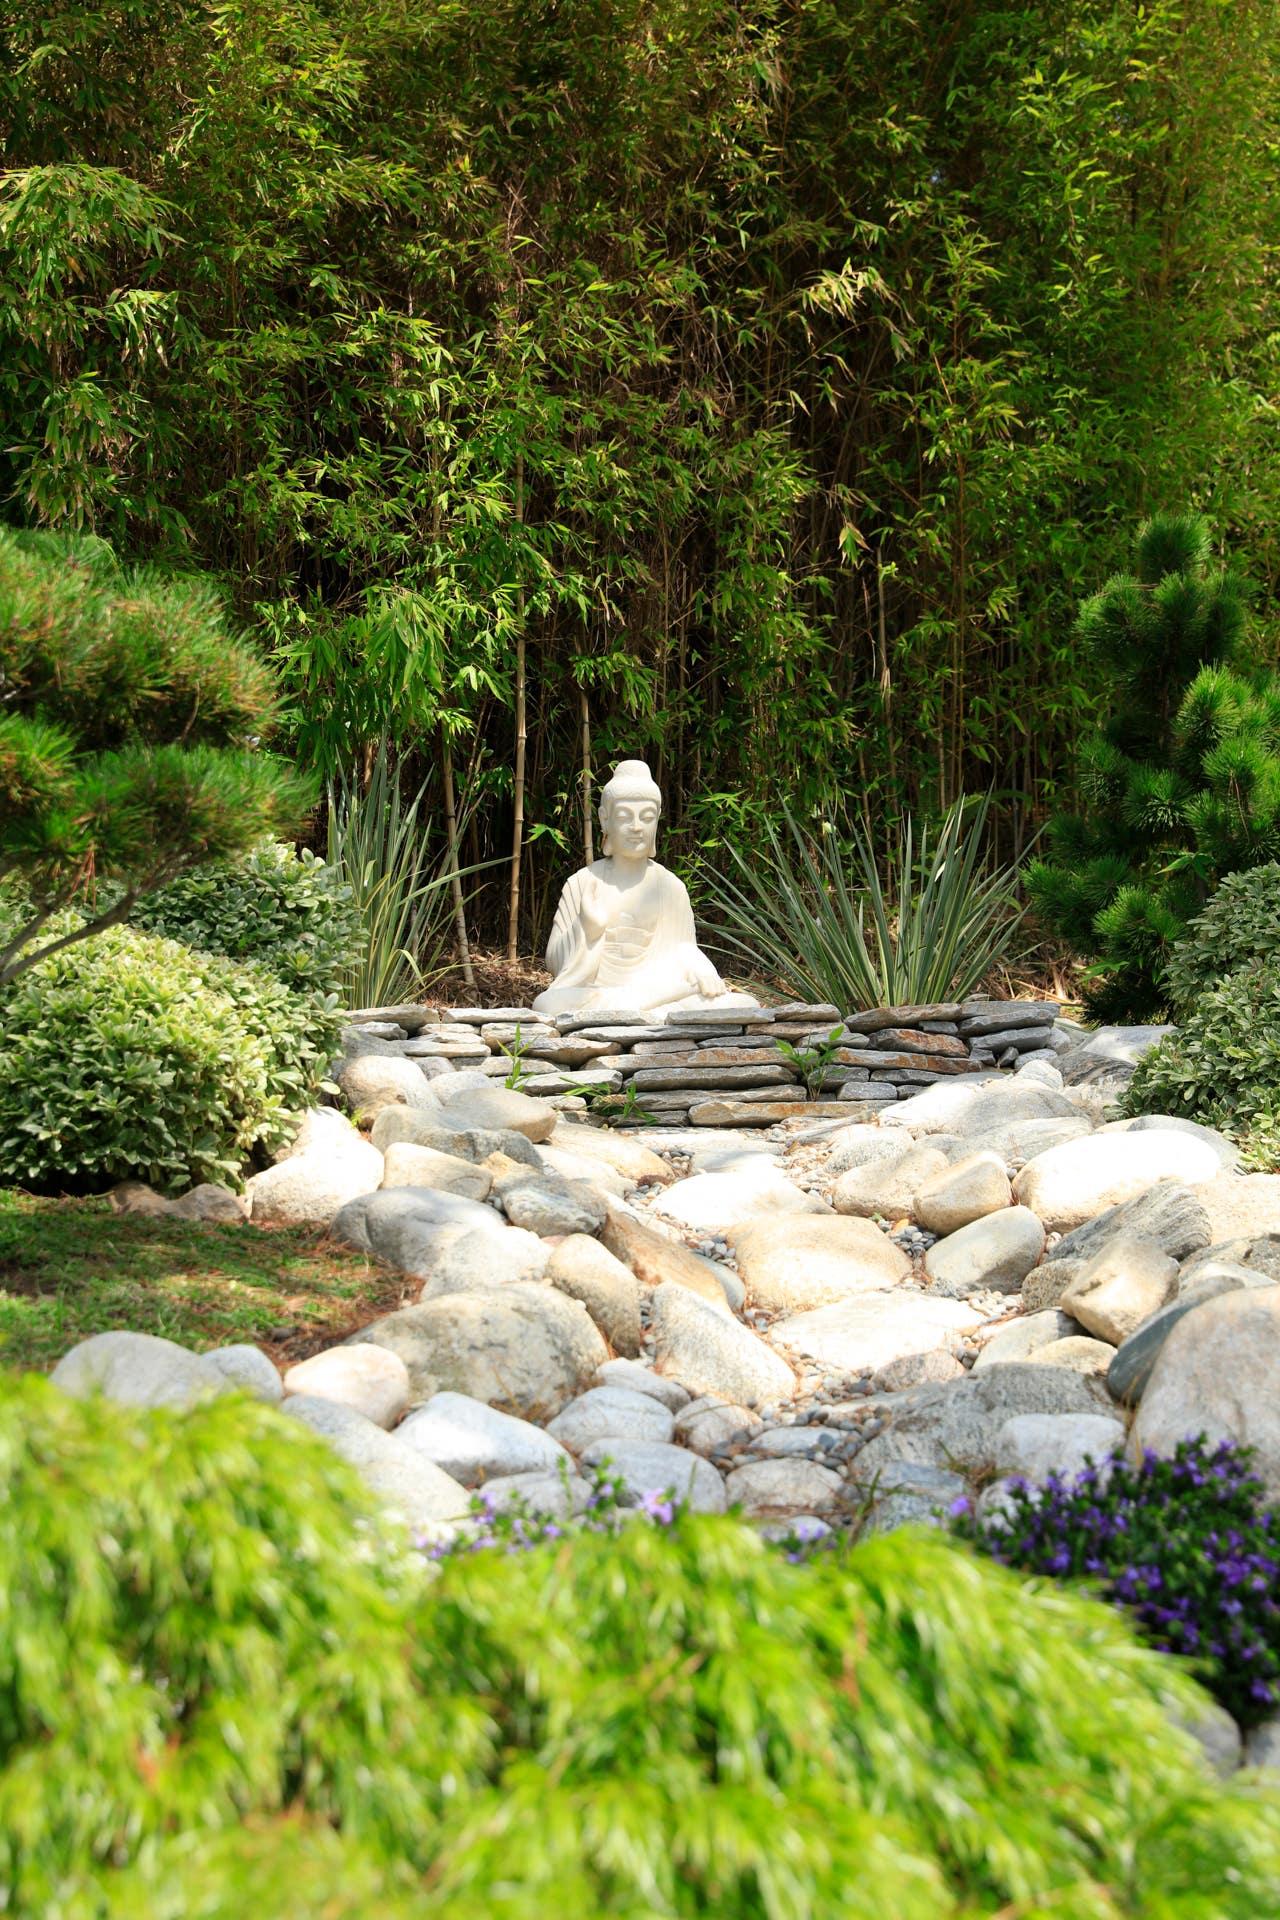 Self Realization Lake Shrine Buddha 2019